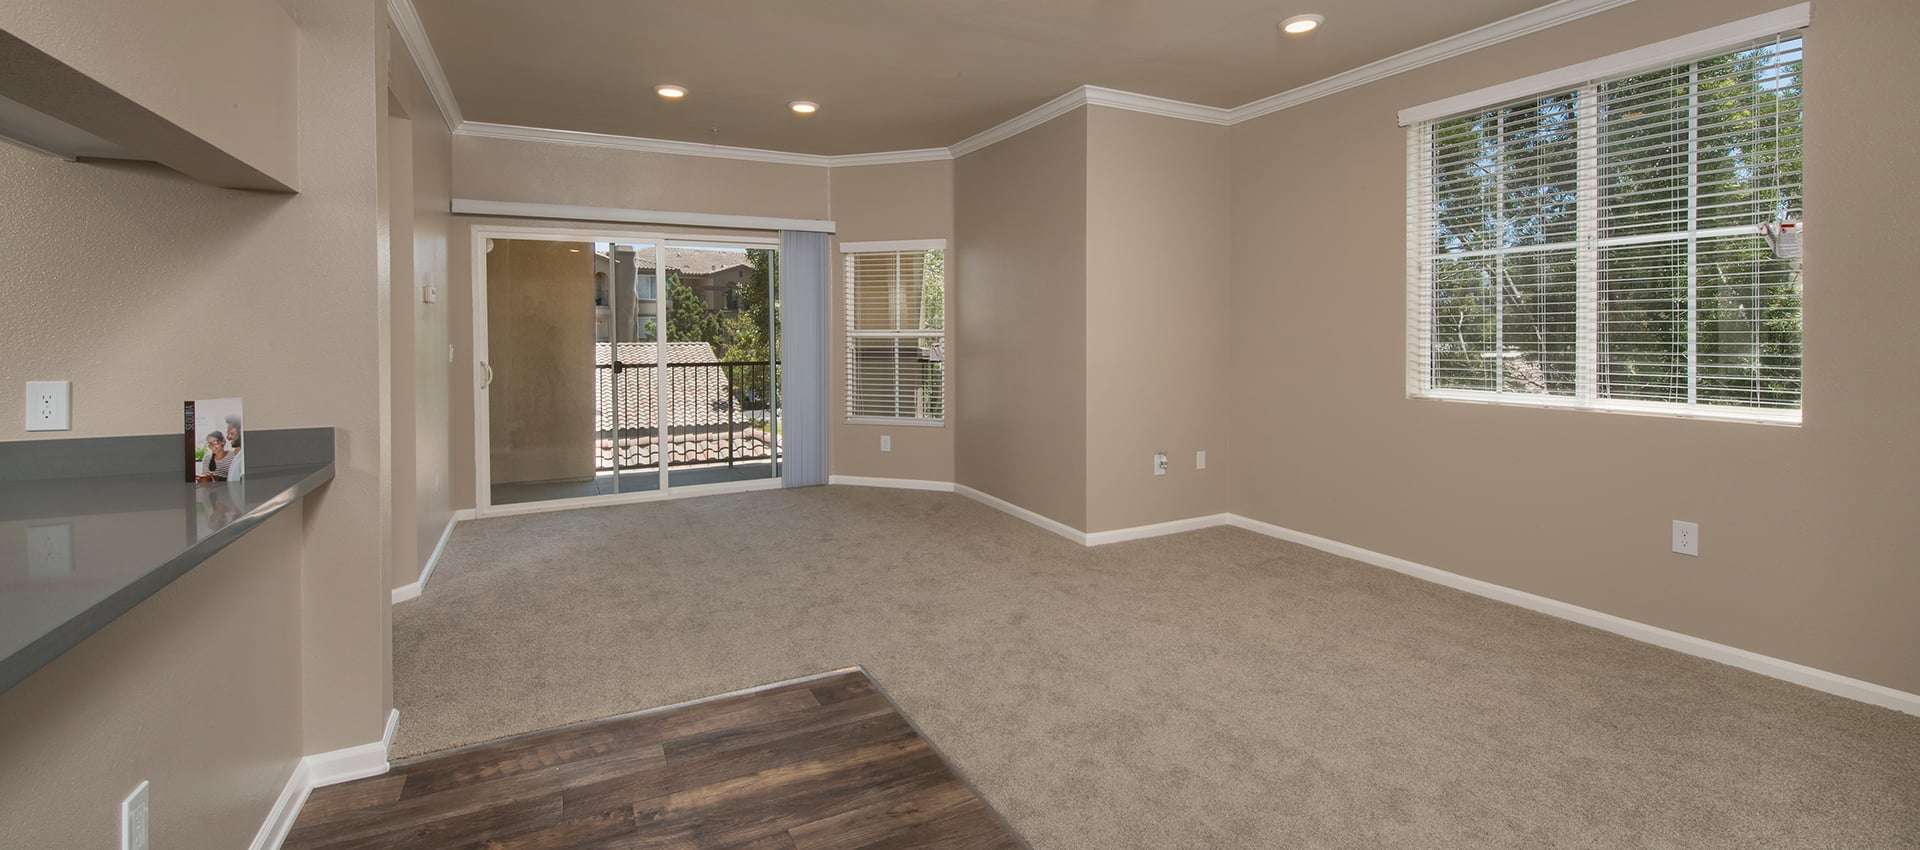 Spacious floor plan at Esplanade Apartment Homes in Riverside, California